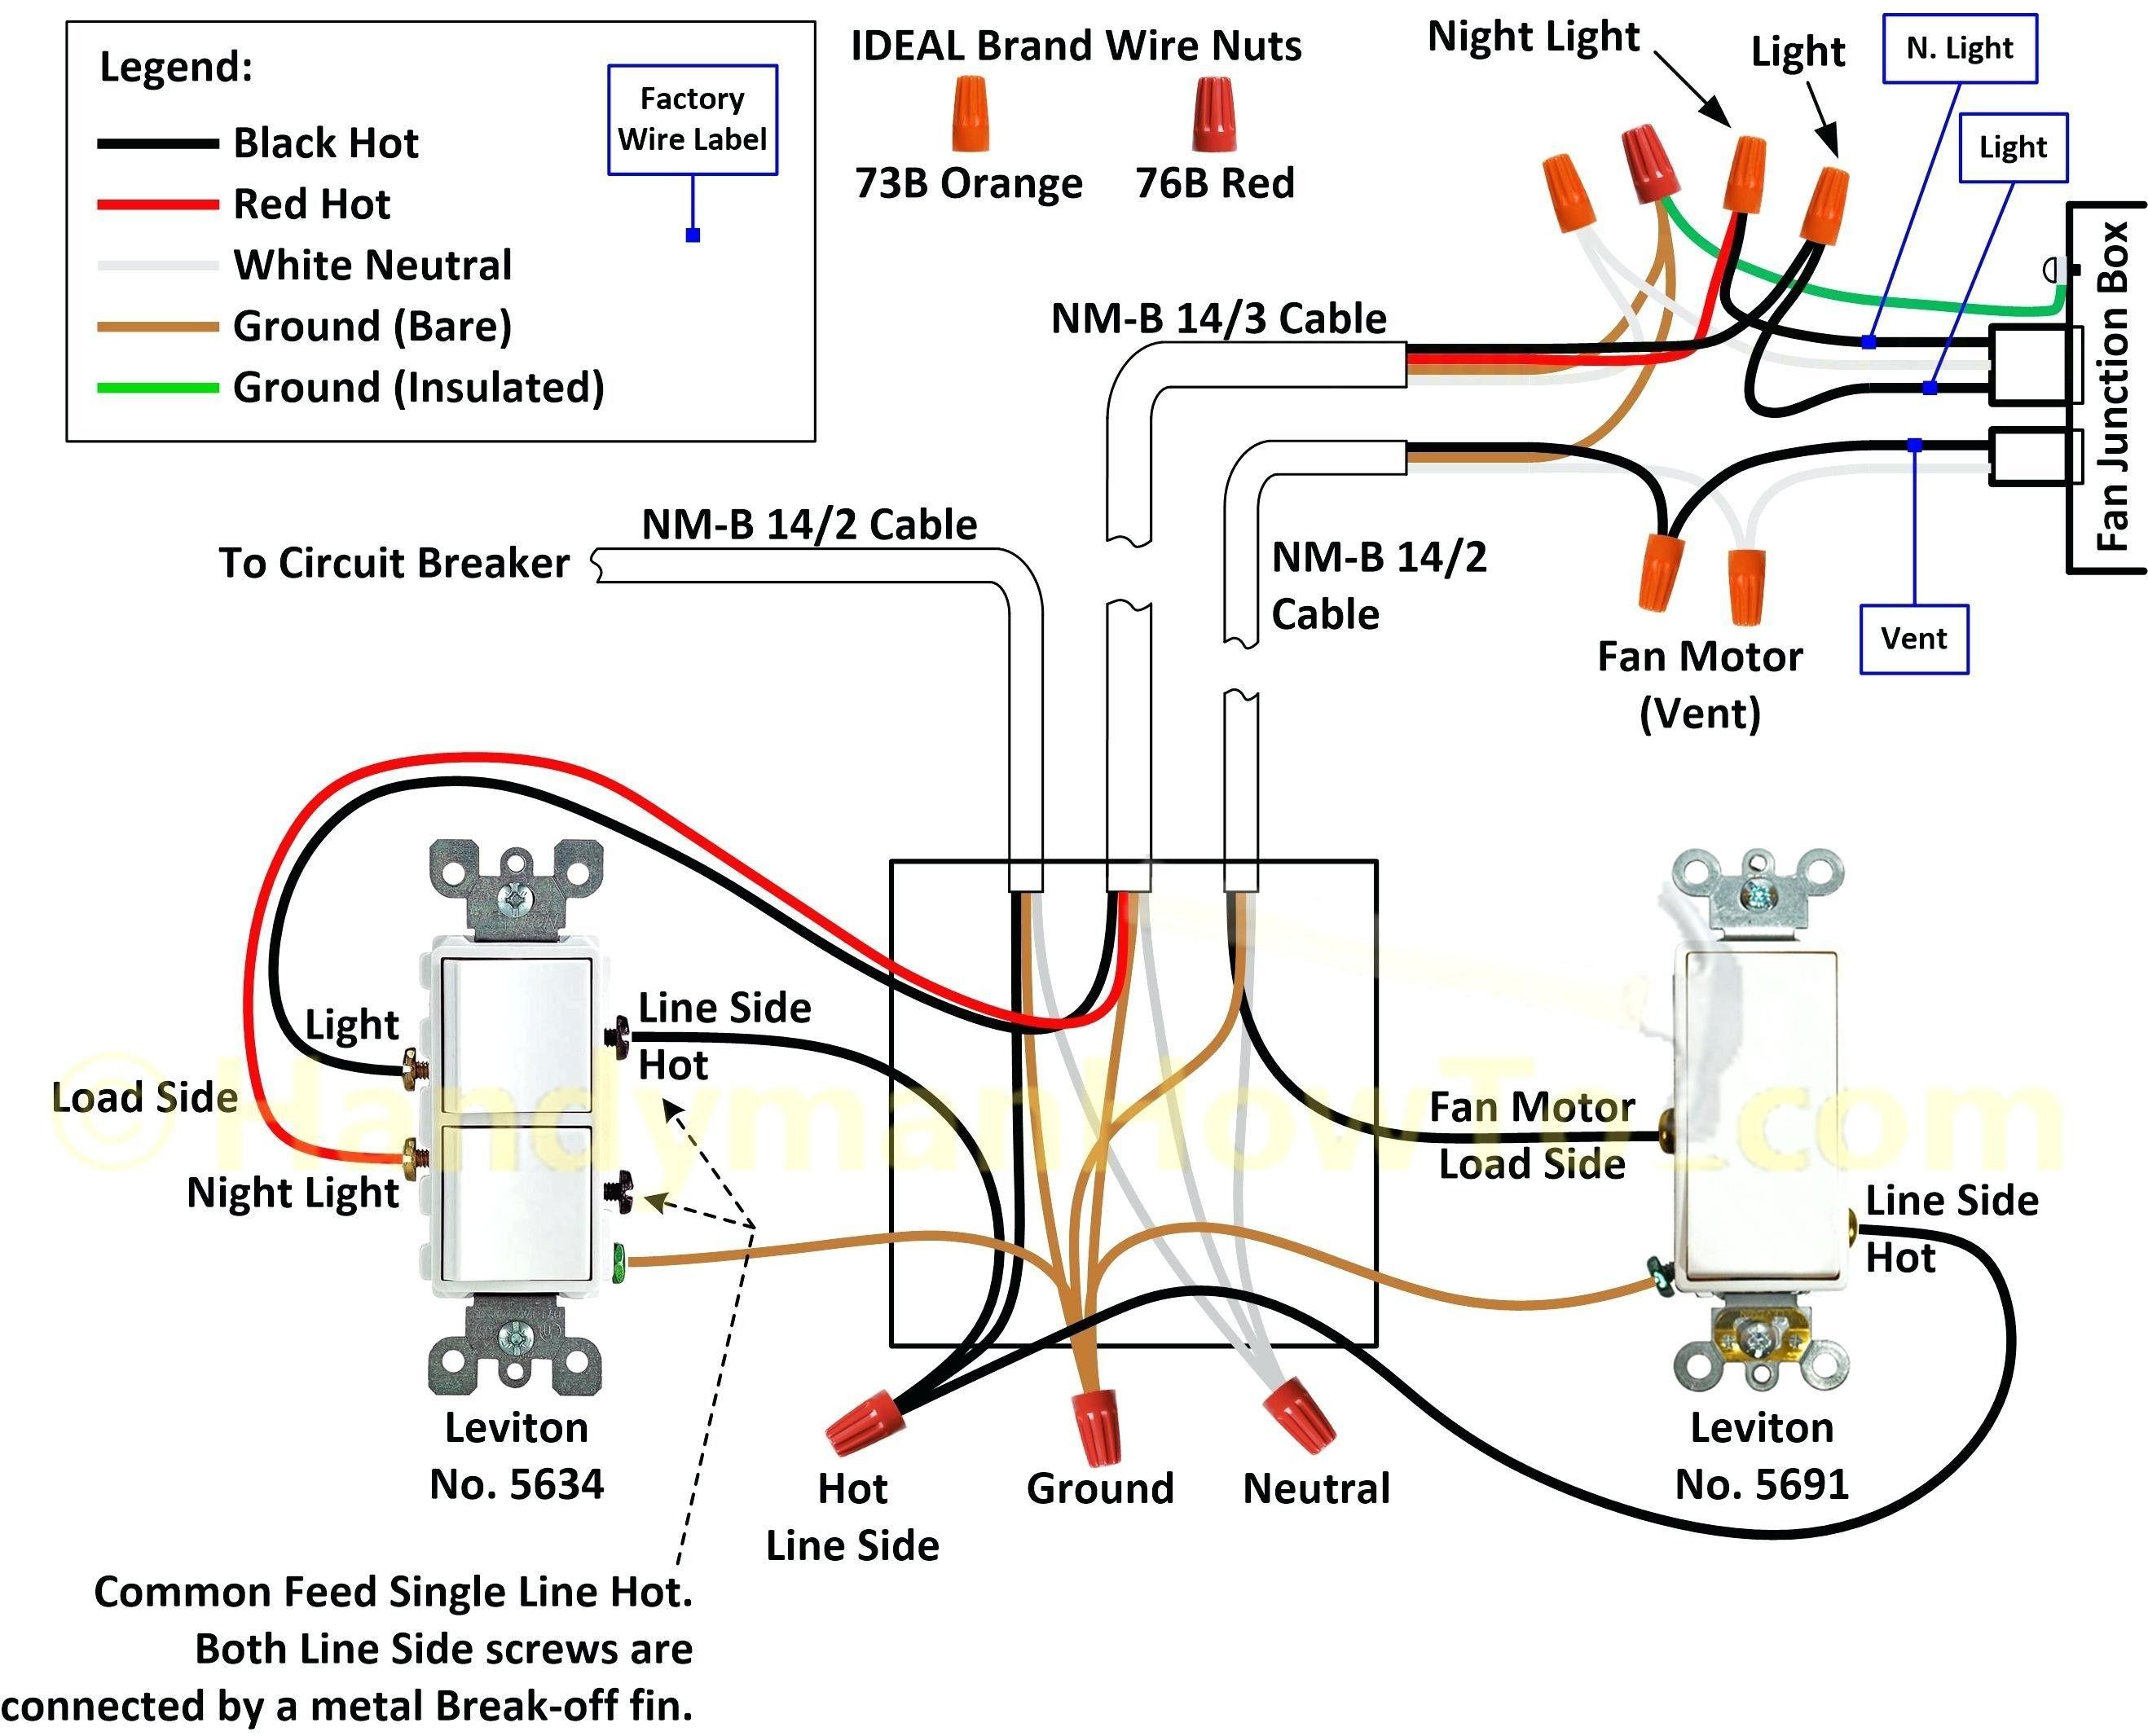 Elegant Wiring Diagram Nz Diagrams Digramssample Diagramimages Wiringdiagramsample Wiringdiagram Check M Fan Light Switch Light Switch Wiring Bathroom Fan